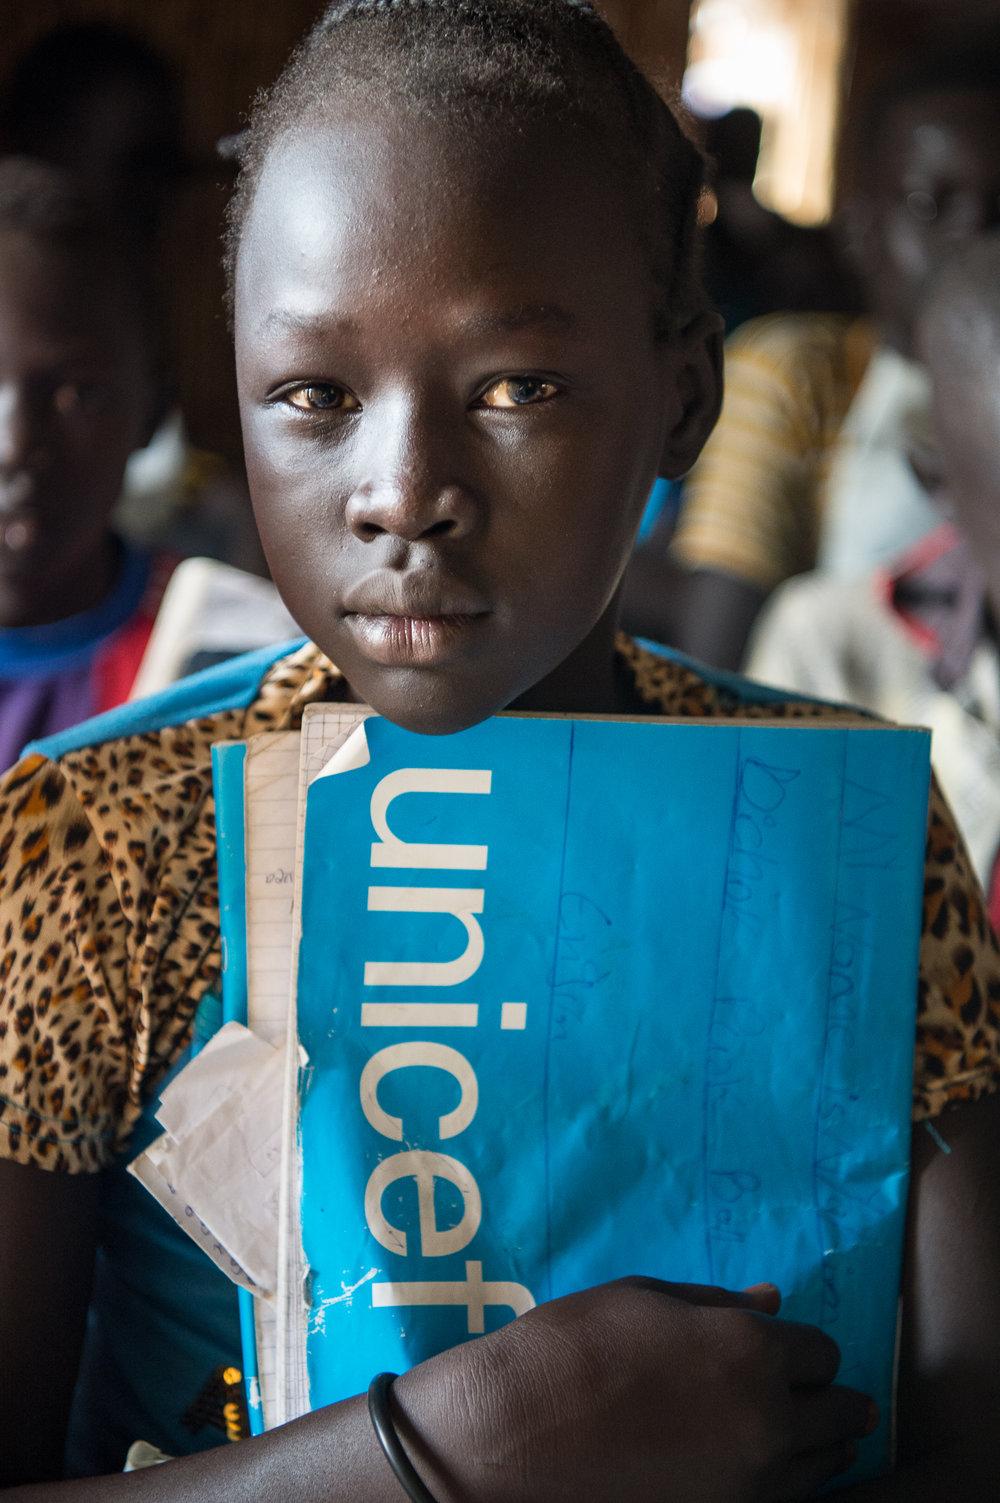 AE_SS16_UNICEF__1247.jpg